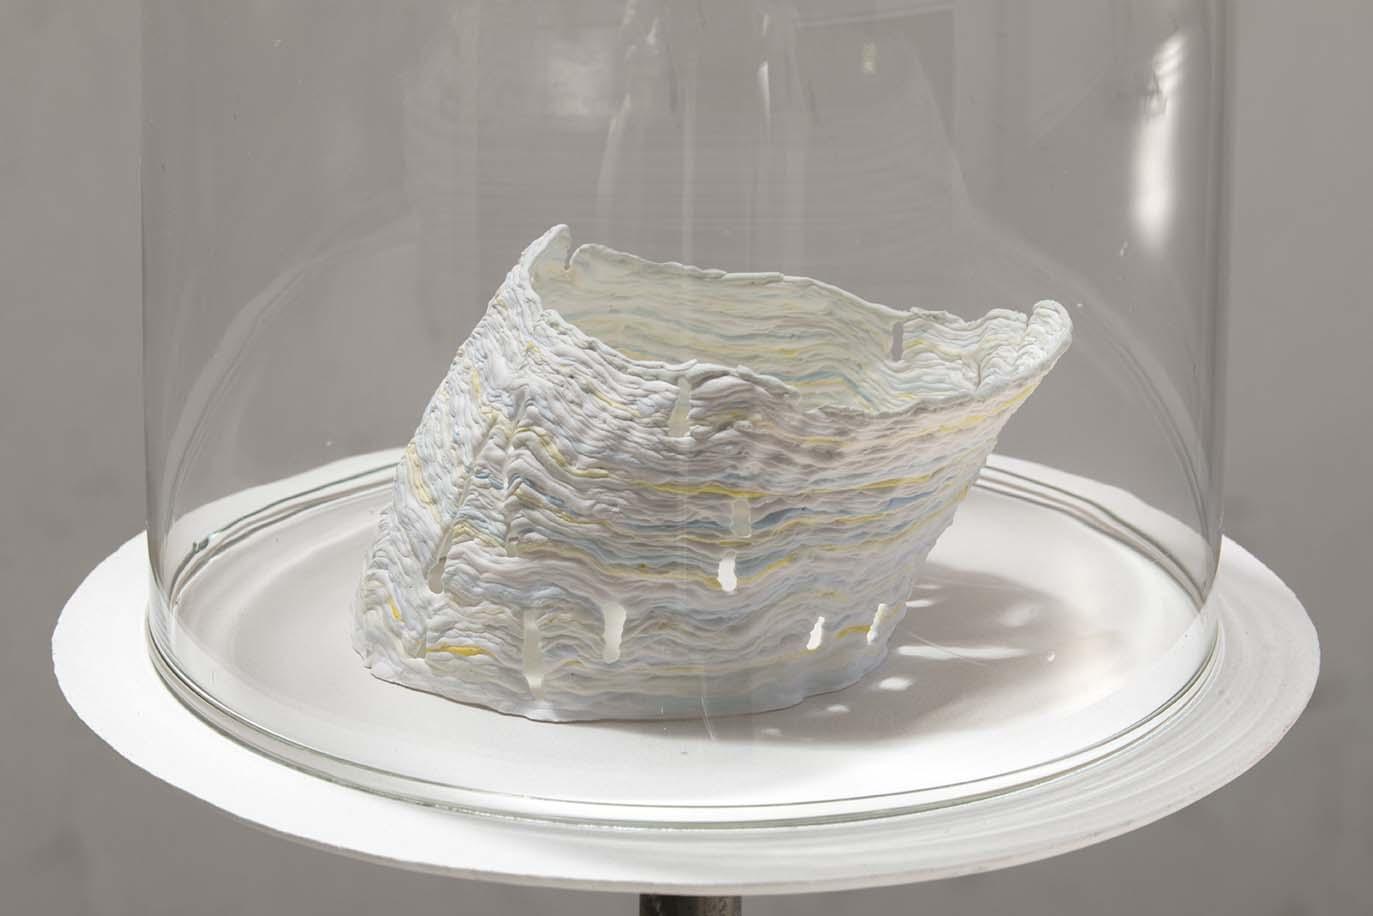 repas-frugal-hugo-bel-artiste-sculpteur-plasticien